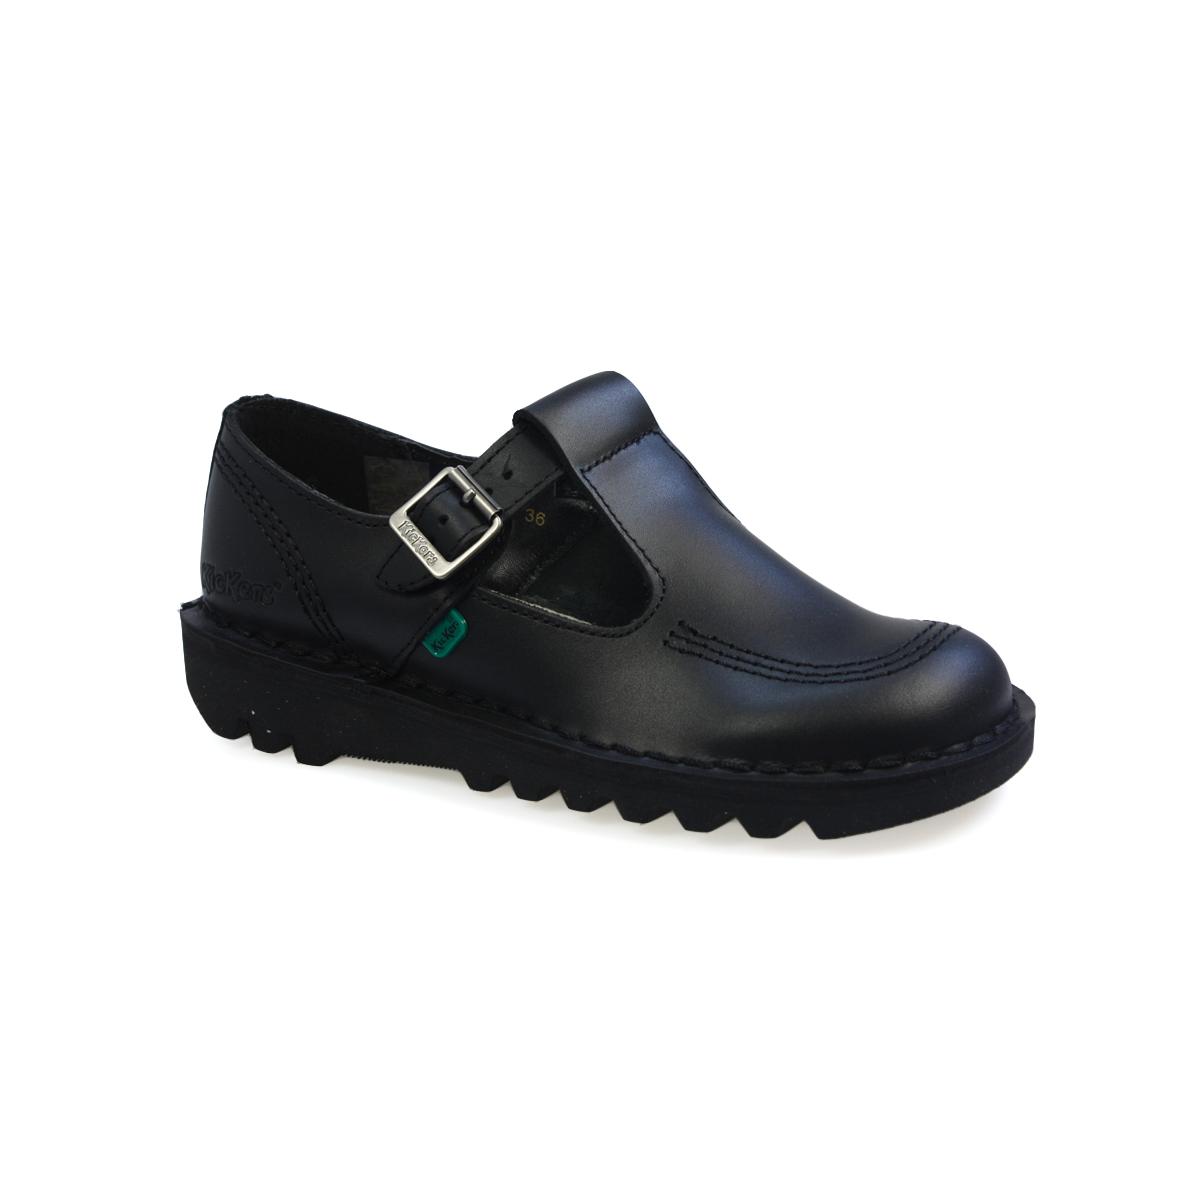 Black kicker sandals - Image Is Loading Kickers Kick Lo Aztec W Core Black Leather